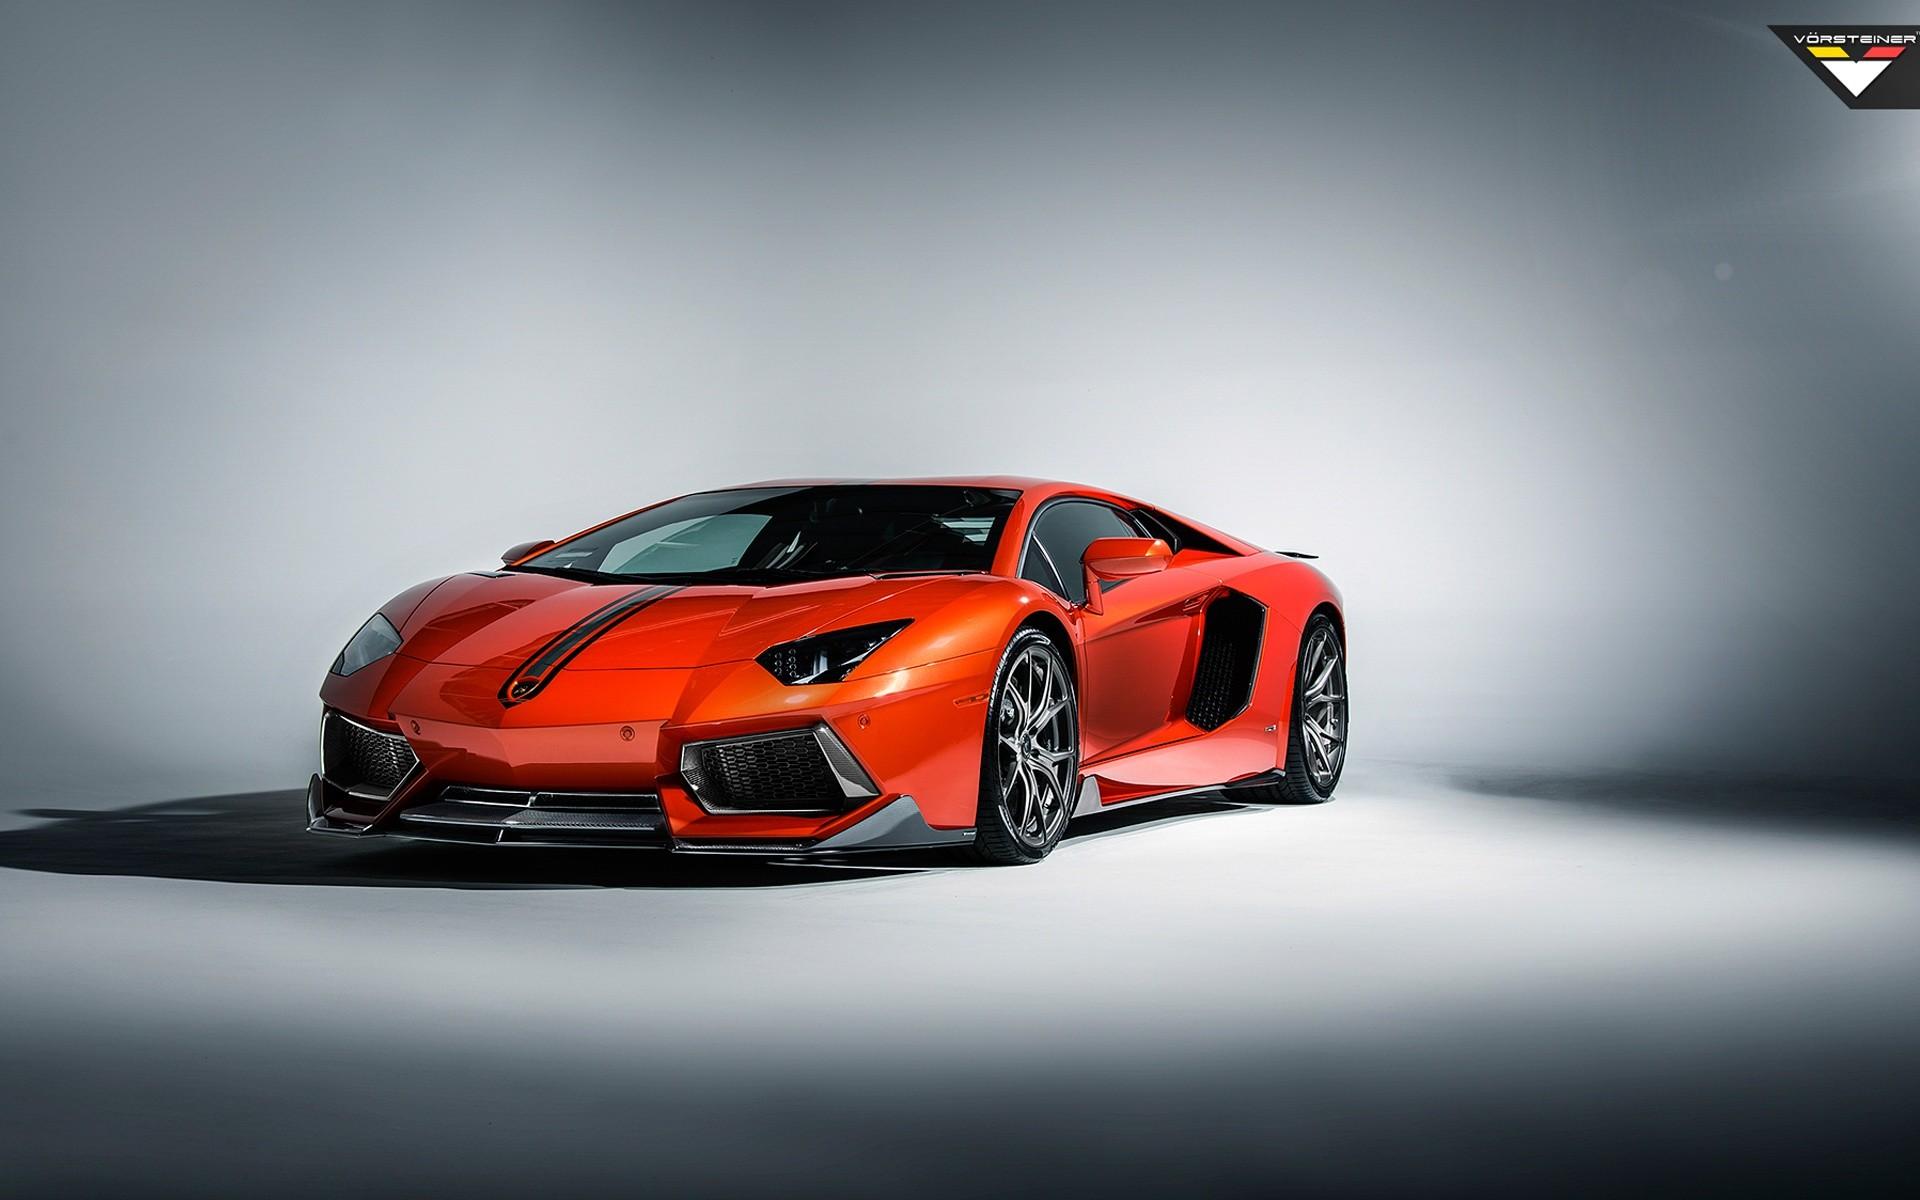 2014 Lamborghini Aventador V LP 740 by Vorsteiner Wallpapers | HD .